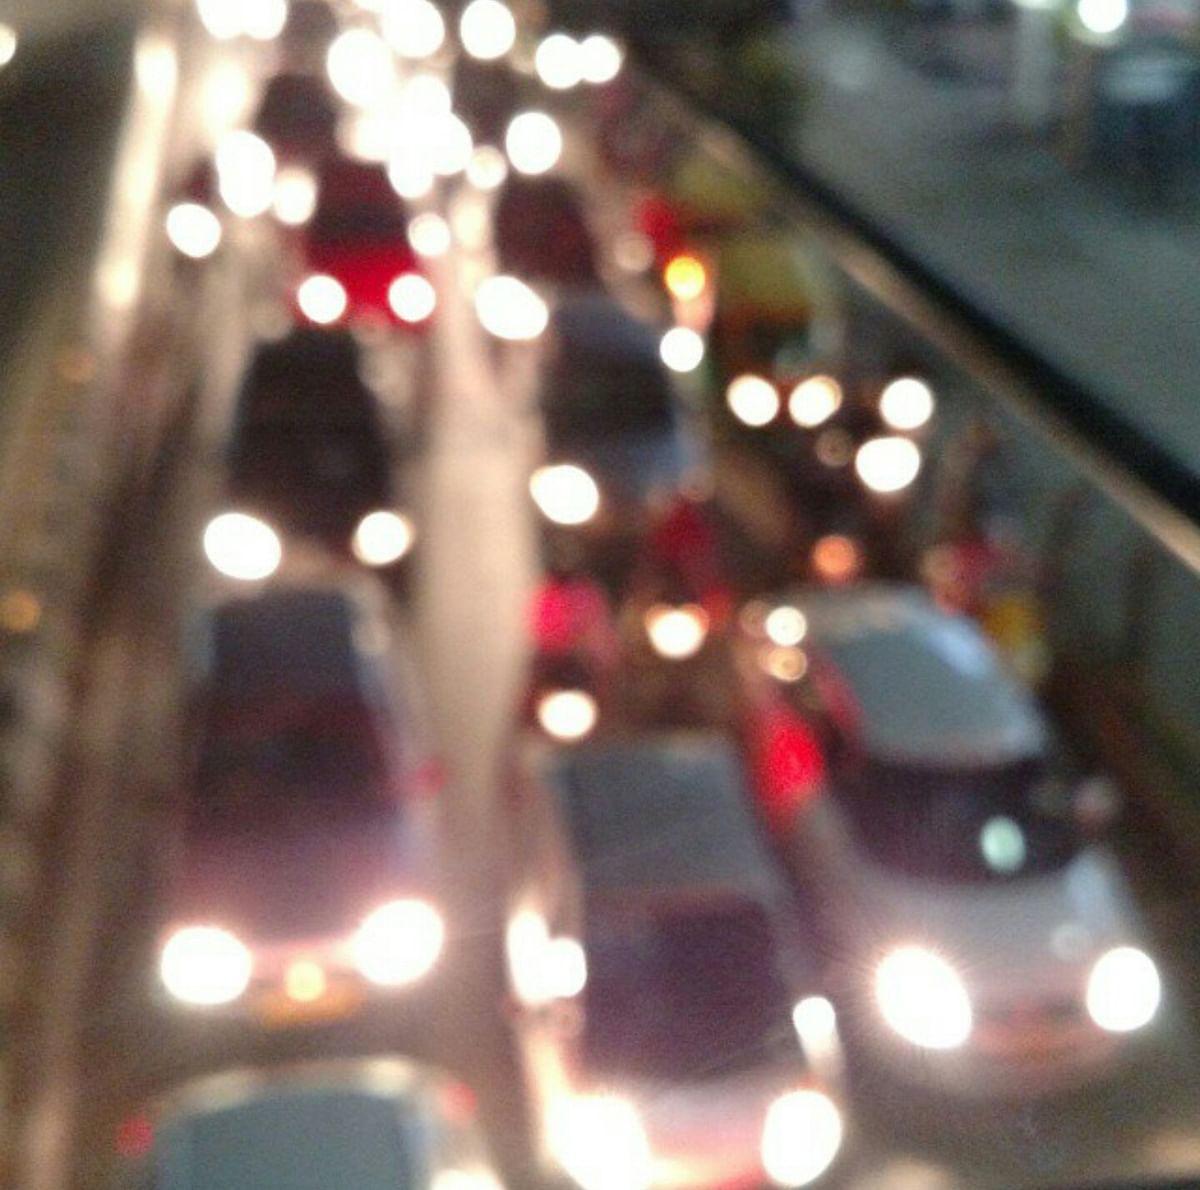 Plea filed in Delhi HC challenging Odd-Even Scheme for vehicles